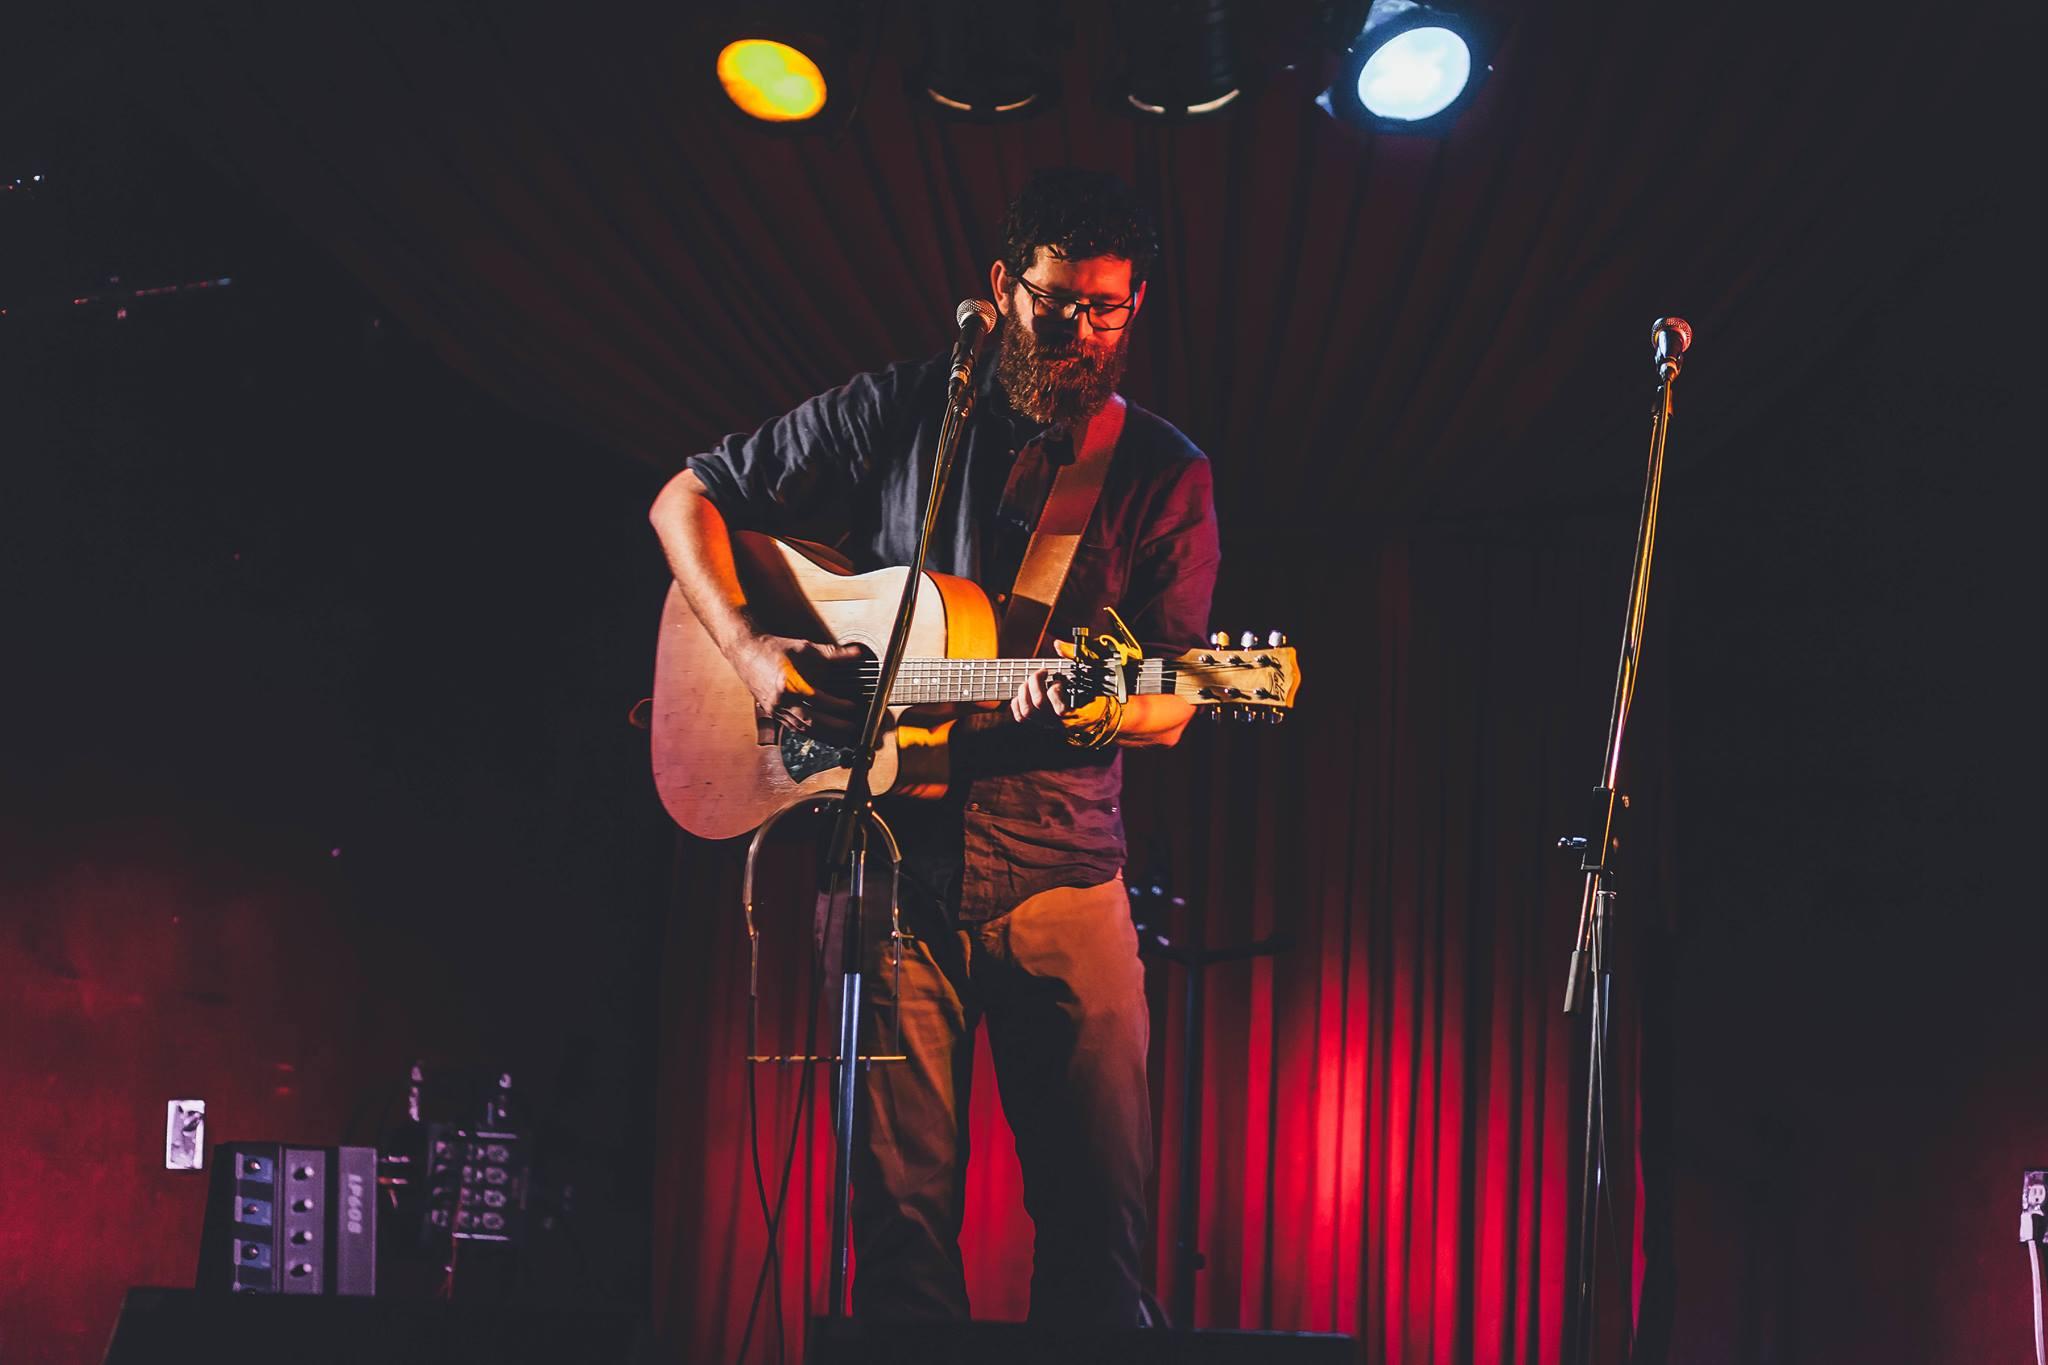 Jim O'Neill Playing Live